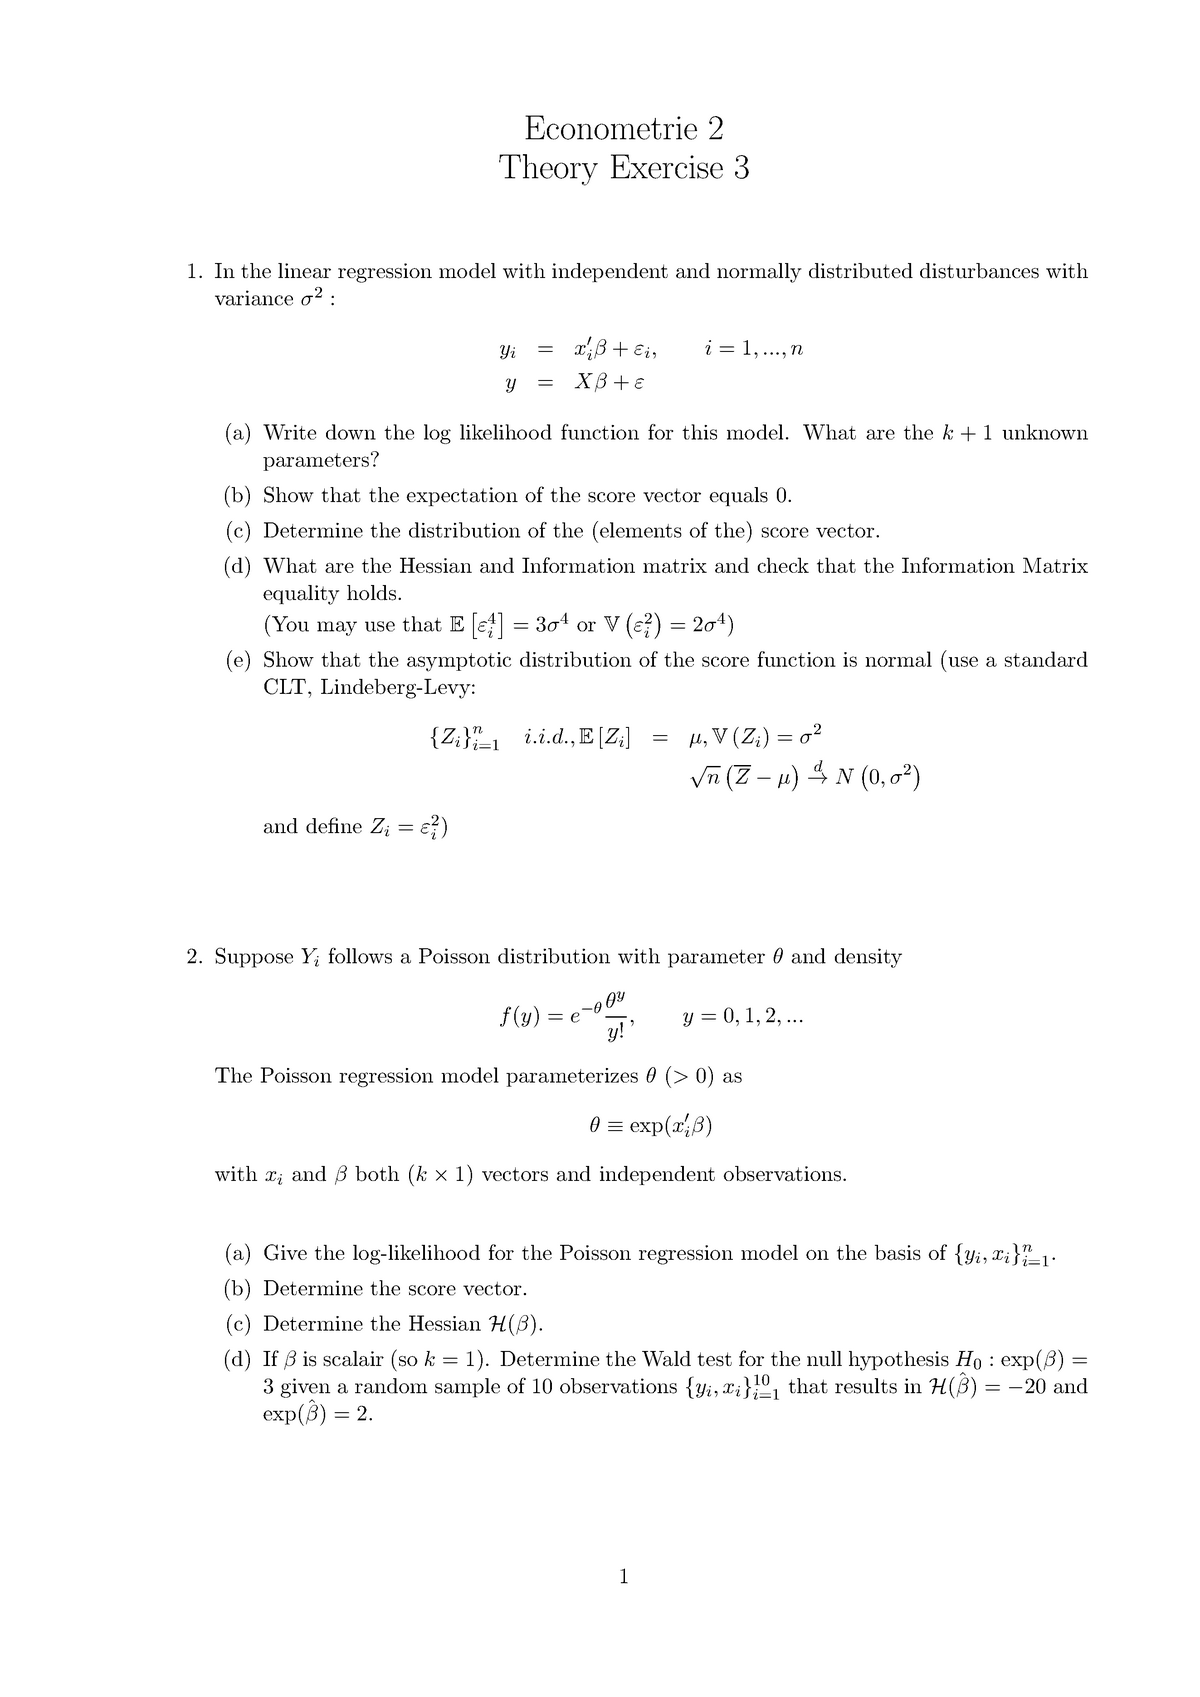 HW3 theory questions - 6012B0285Y: Econometrie 1 - StuDocu